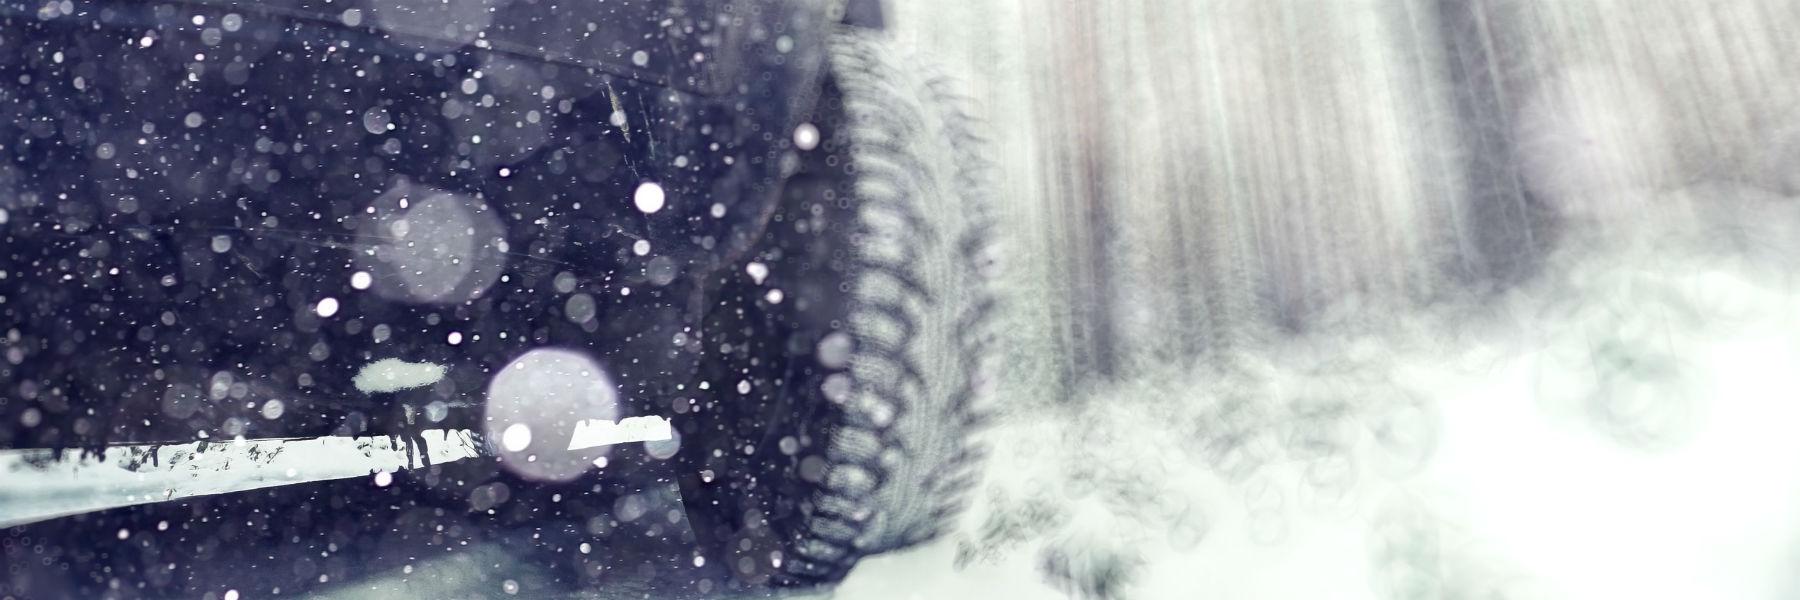 Moto akcesoria zimowe